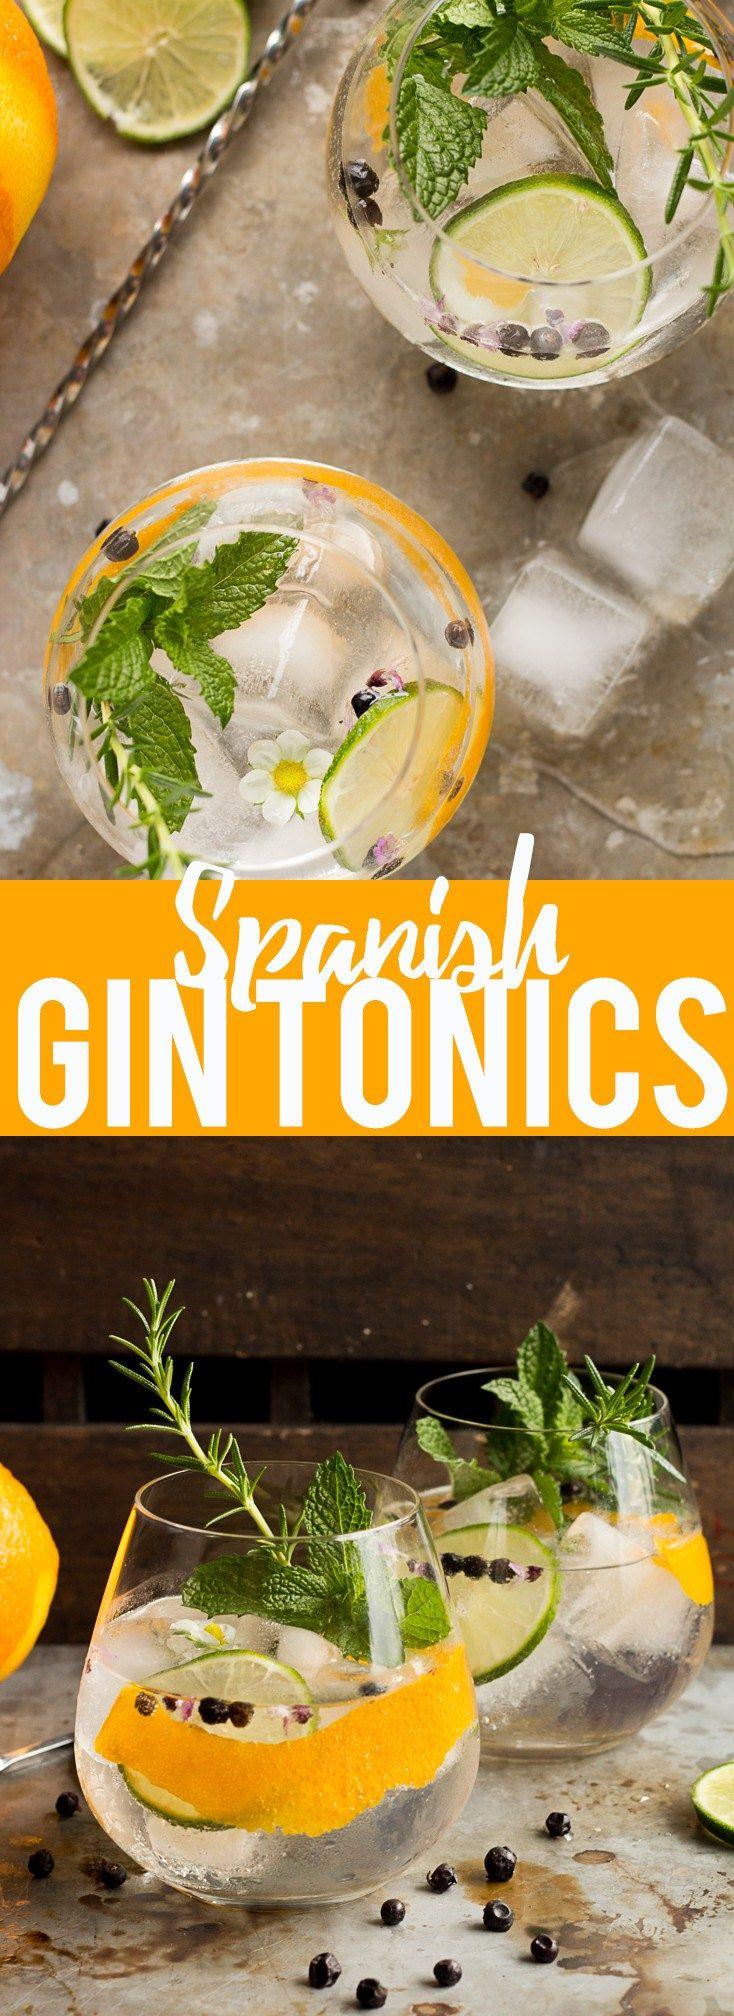 Spanish Gin Tonics | Rezept | Pinterest | Tapas, Getränke und ...